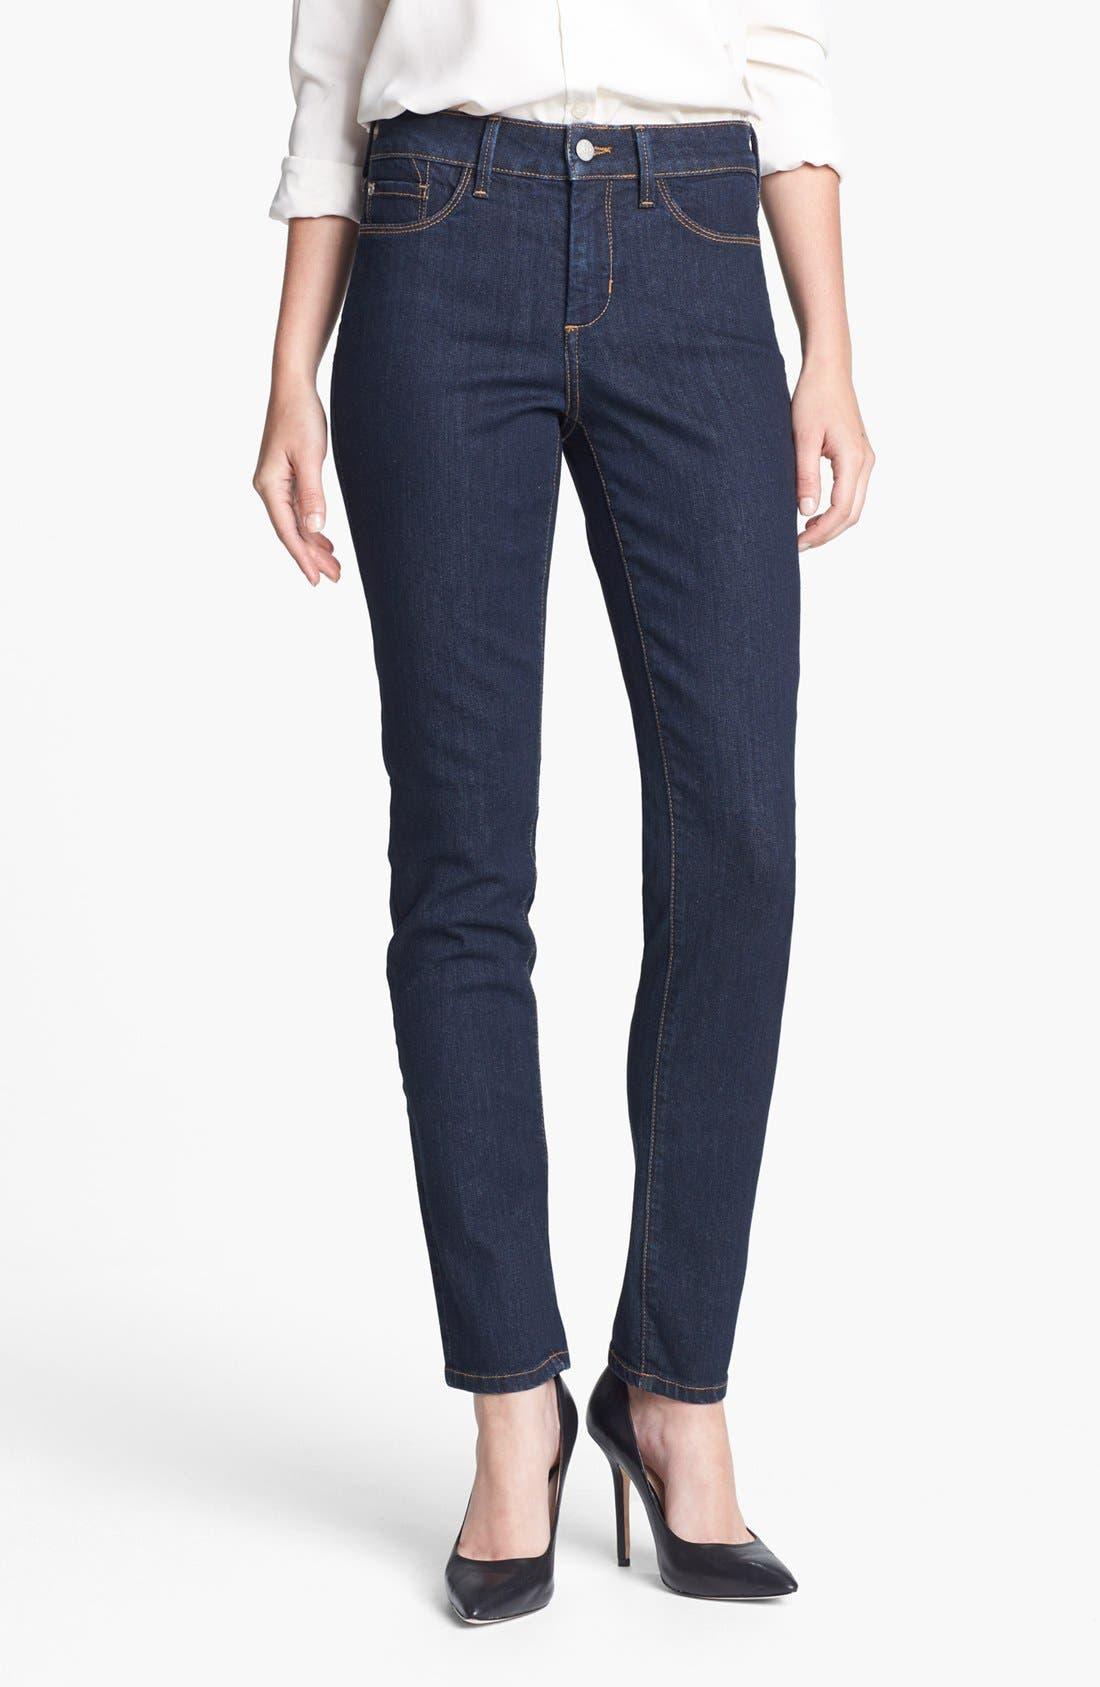 Main Image - NYDJ 'Alina' Stretch Skinny Jeans (Larchmont) (Regular & Petite)